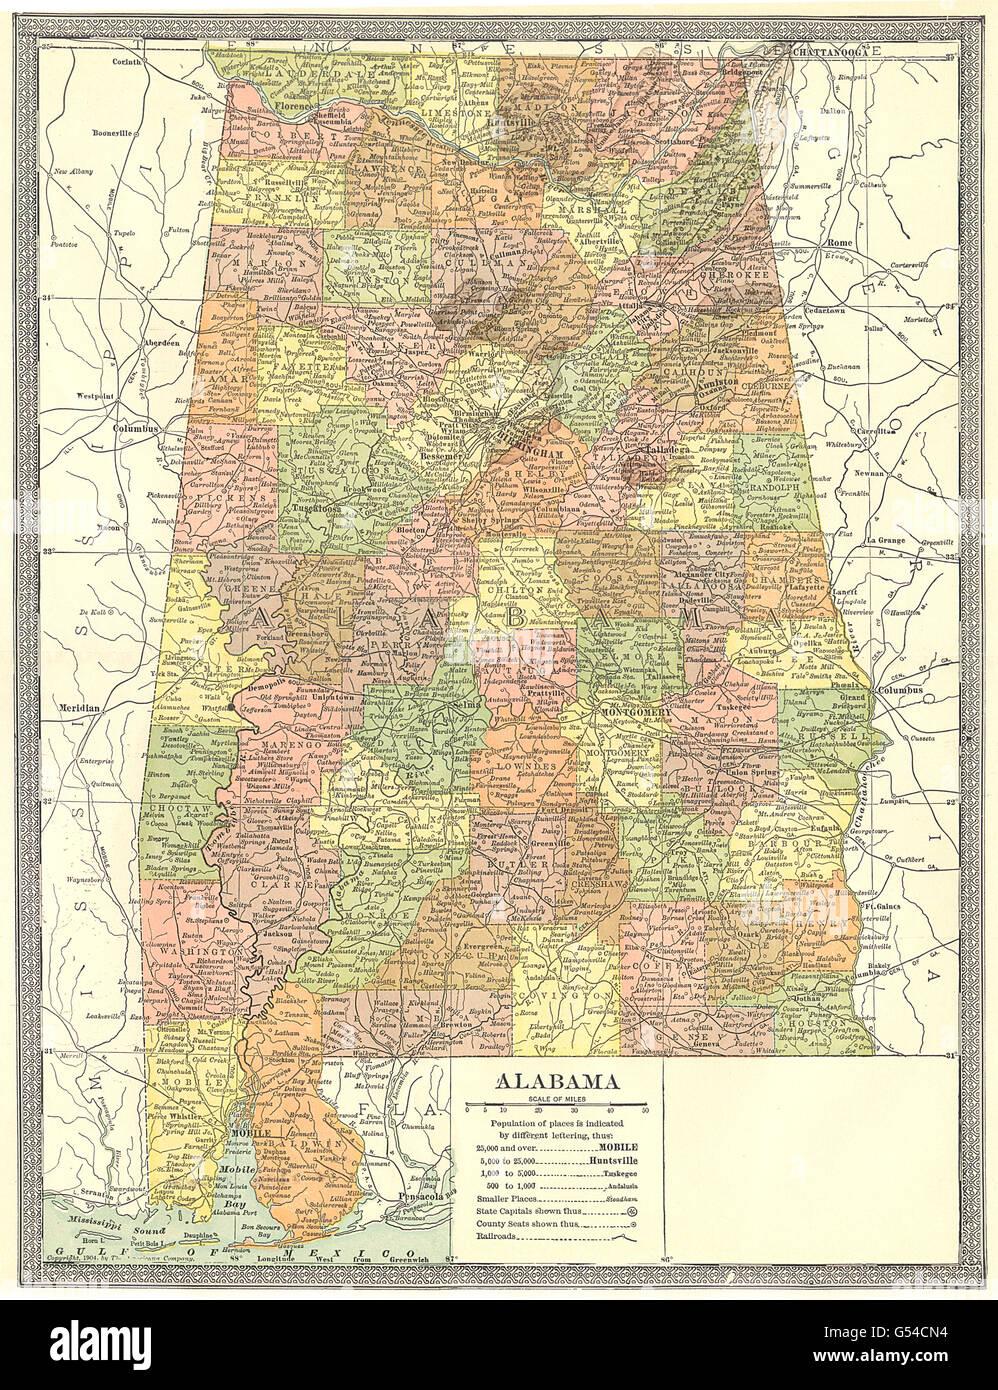 ALABAMA state map. Counties, 1907 Stock Photo: 106433296 - Alamy